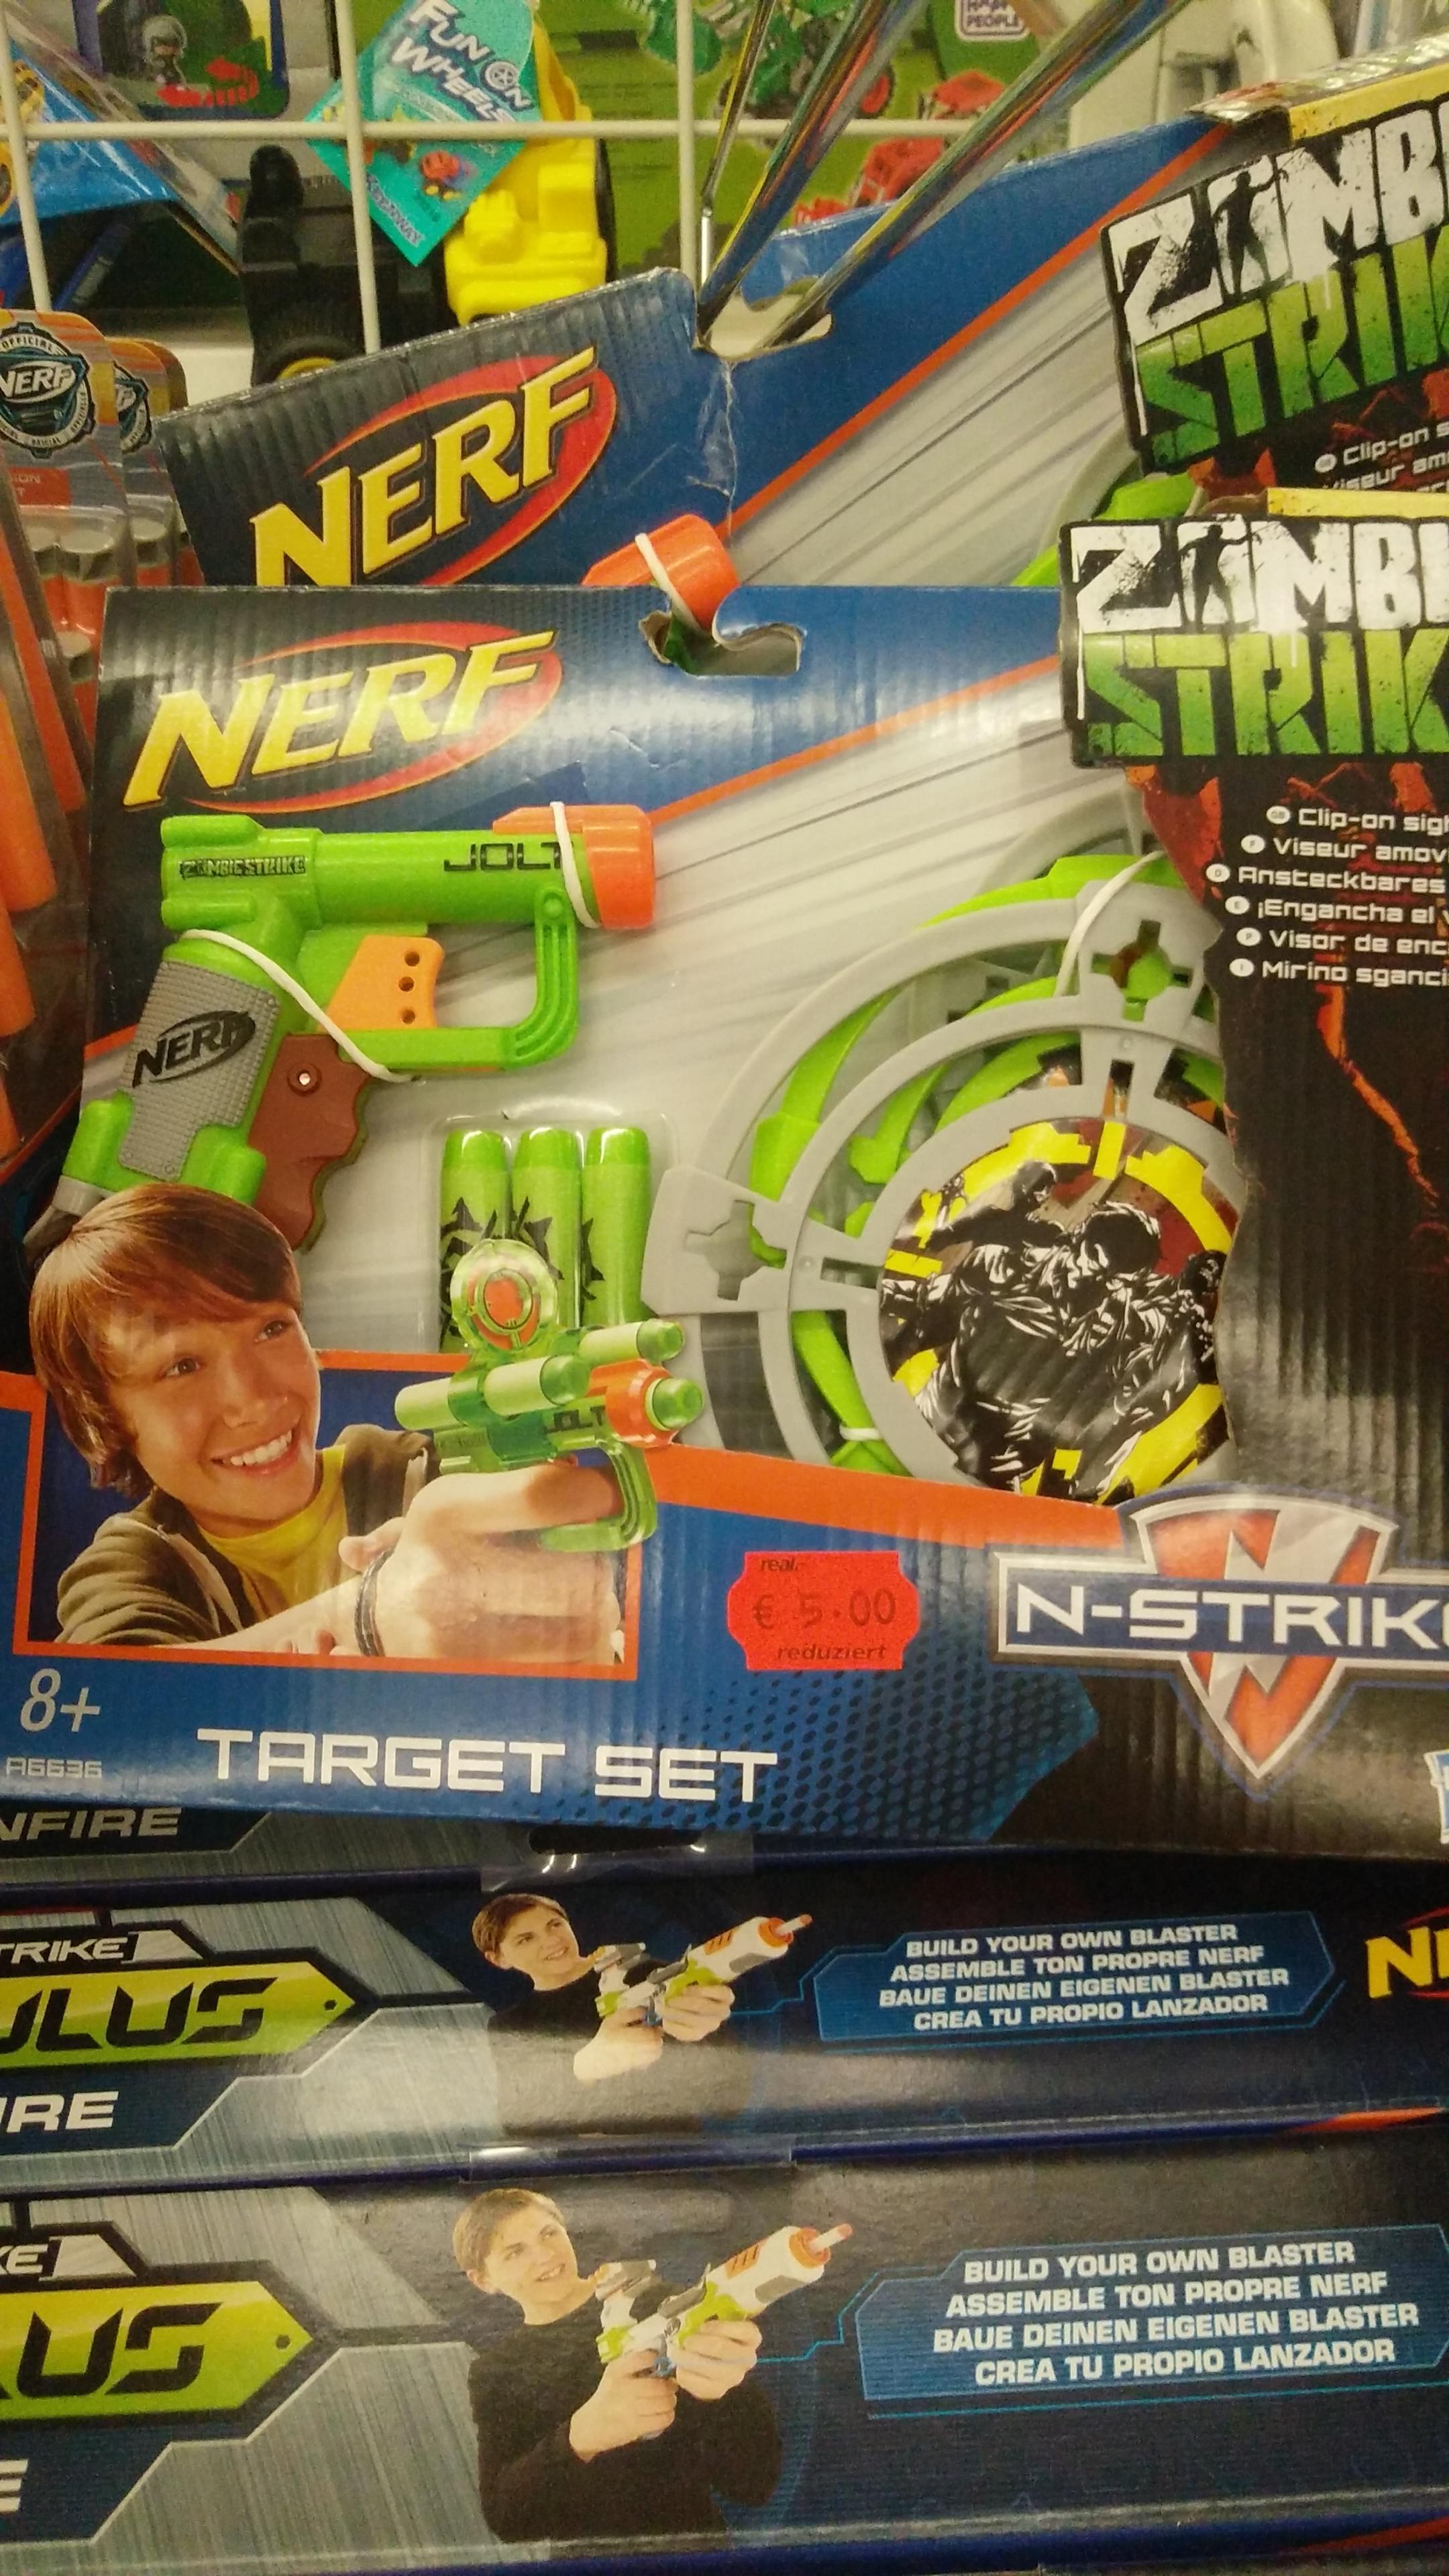 [Lokal] Real Wiesbaden - Hasbro Nerv Zombie Strike